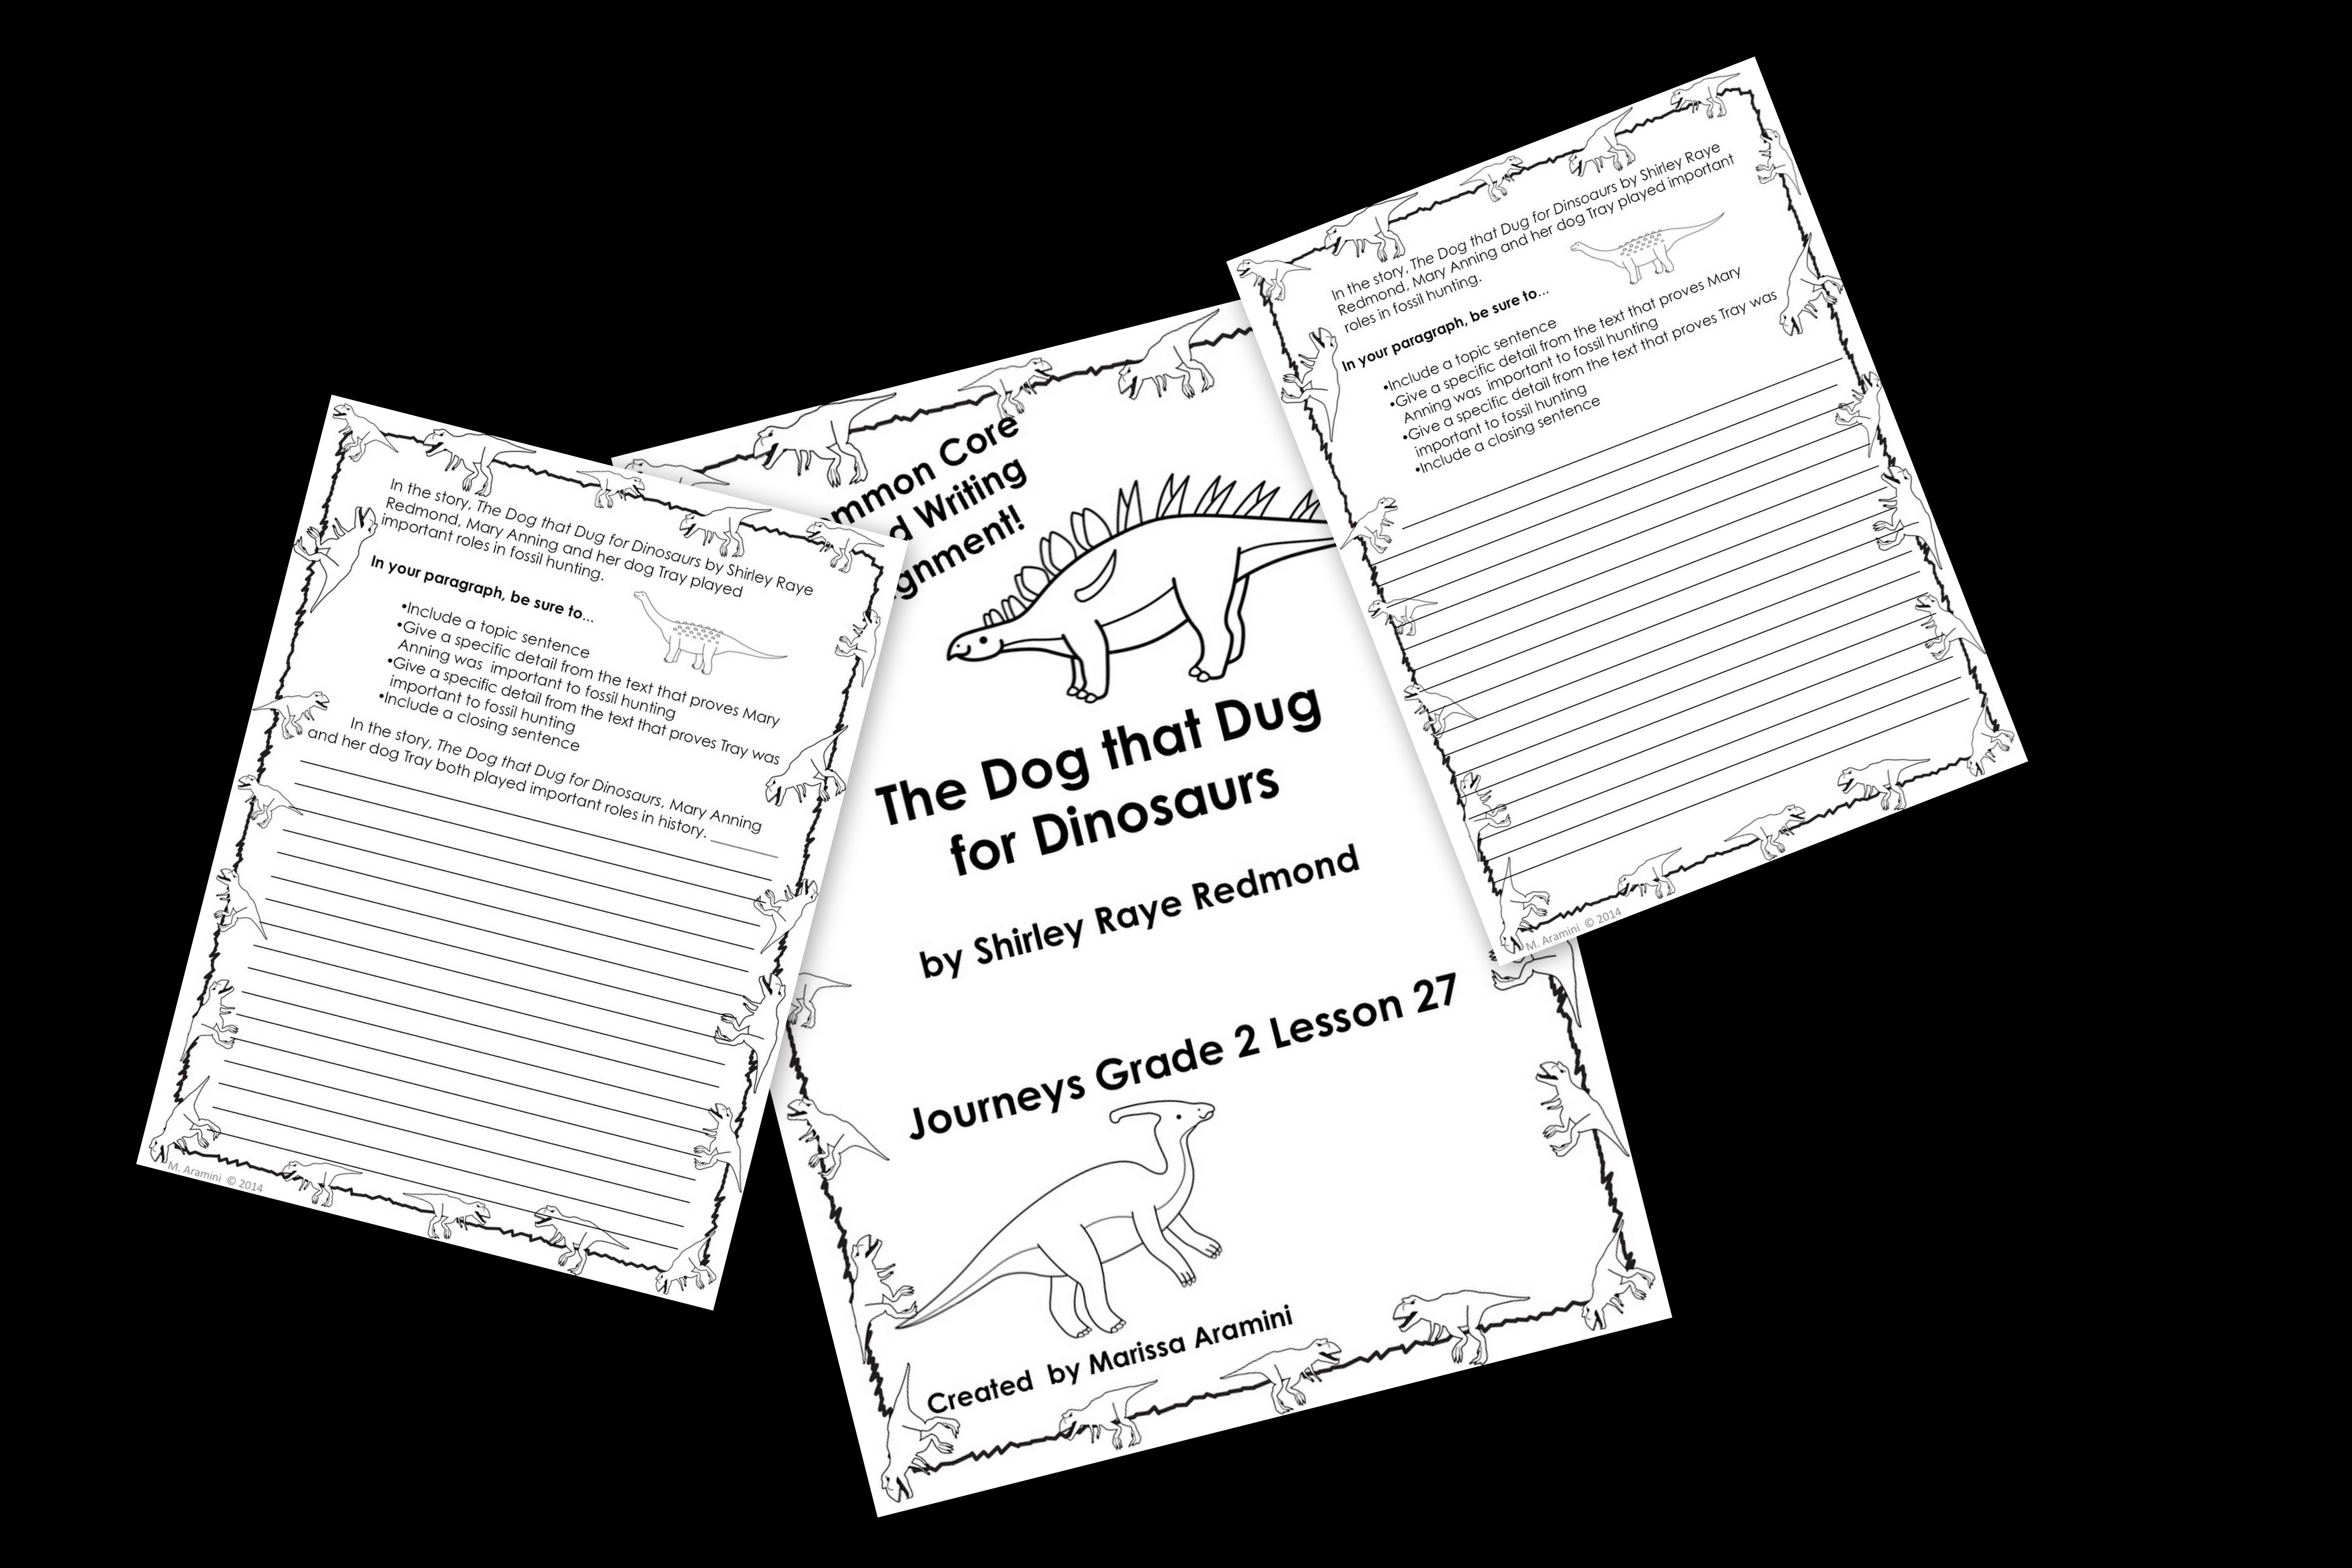 The Dog That Dug For Dinosaurs Journeys Grade 2 Lesson 27